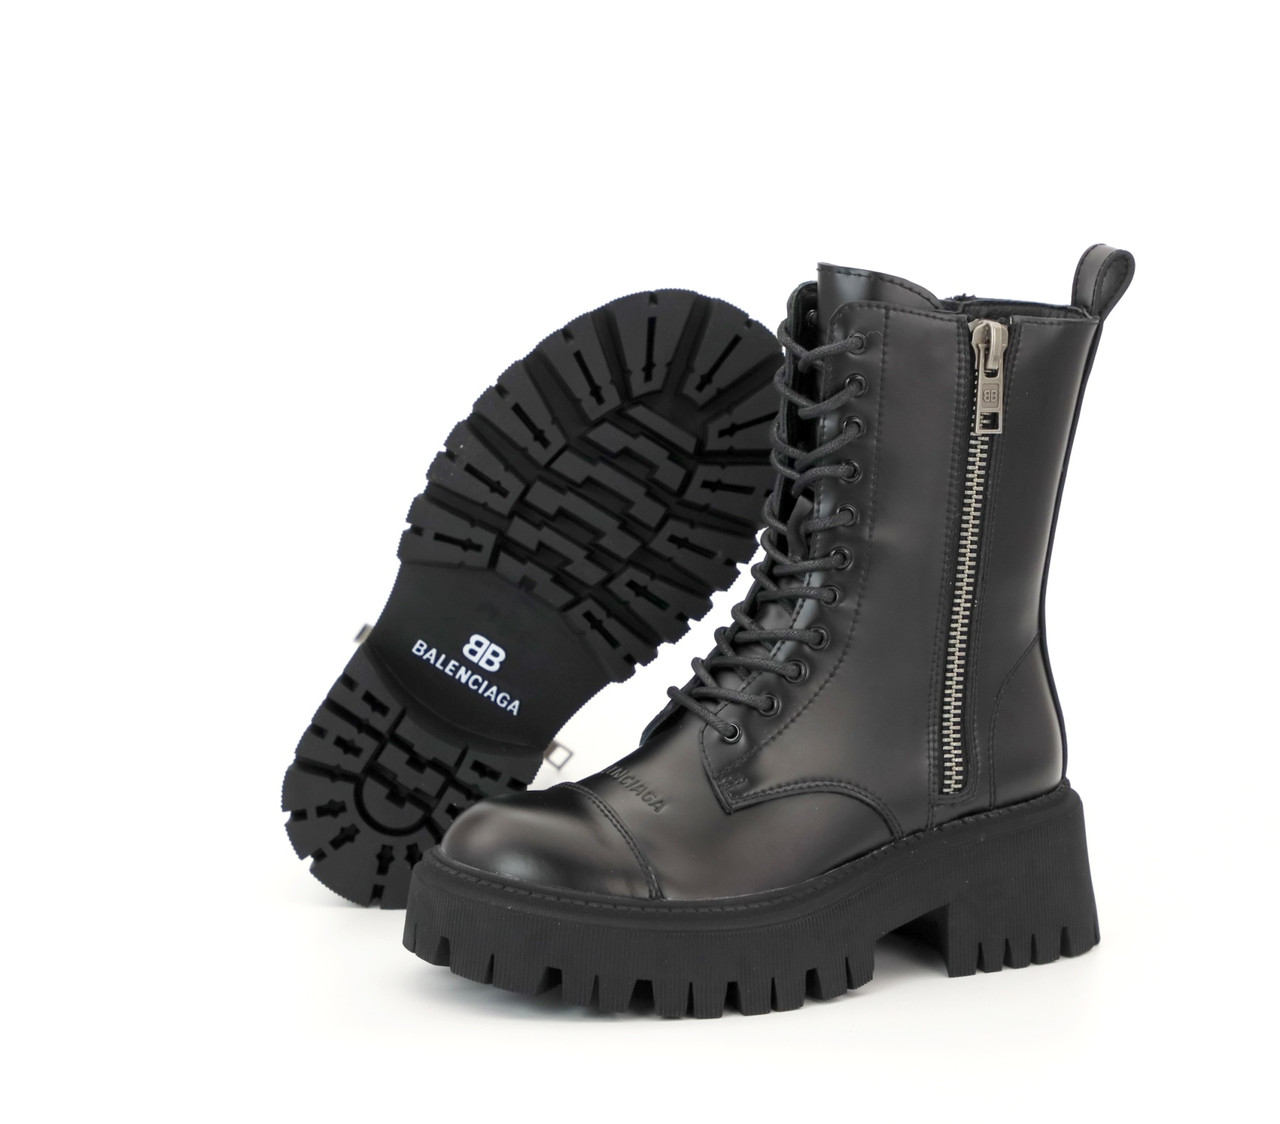 Демисезонные женские ботинки Balenciaga Tractor. ТОП Реплика ААА класса.